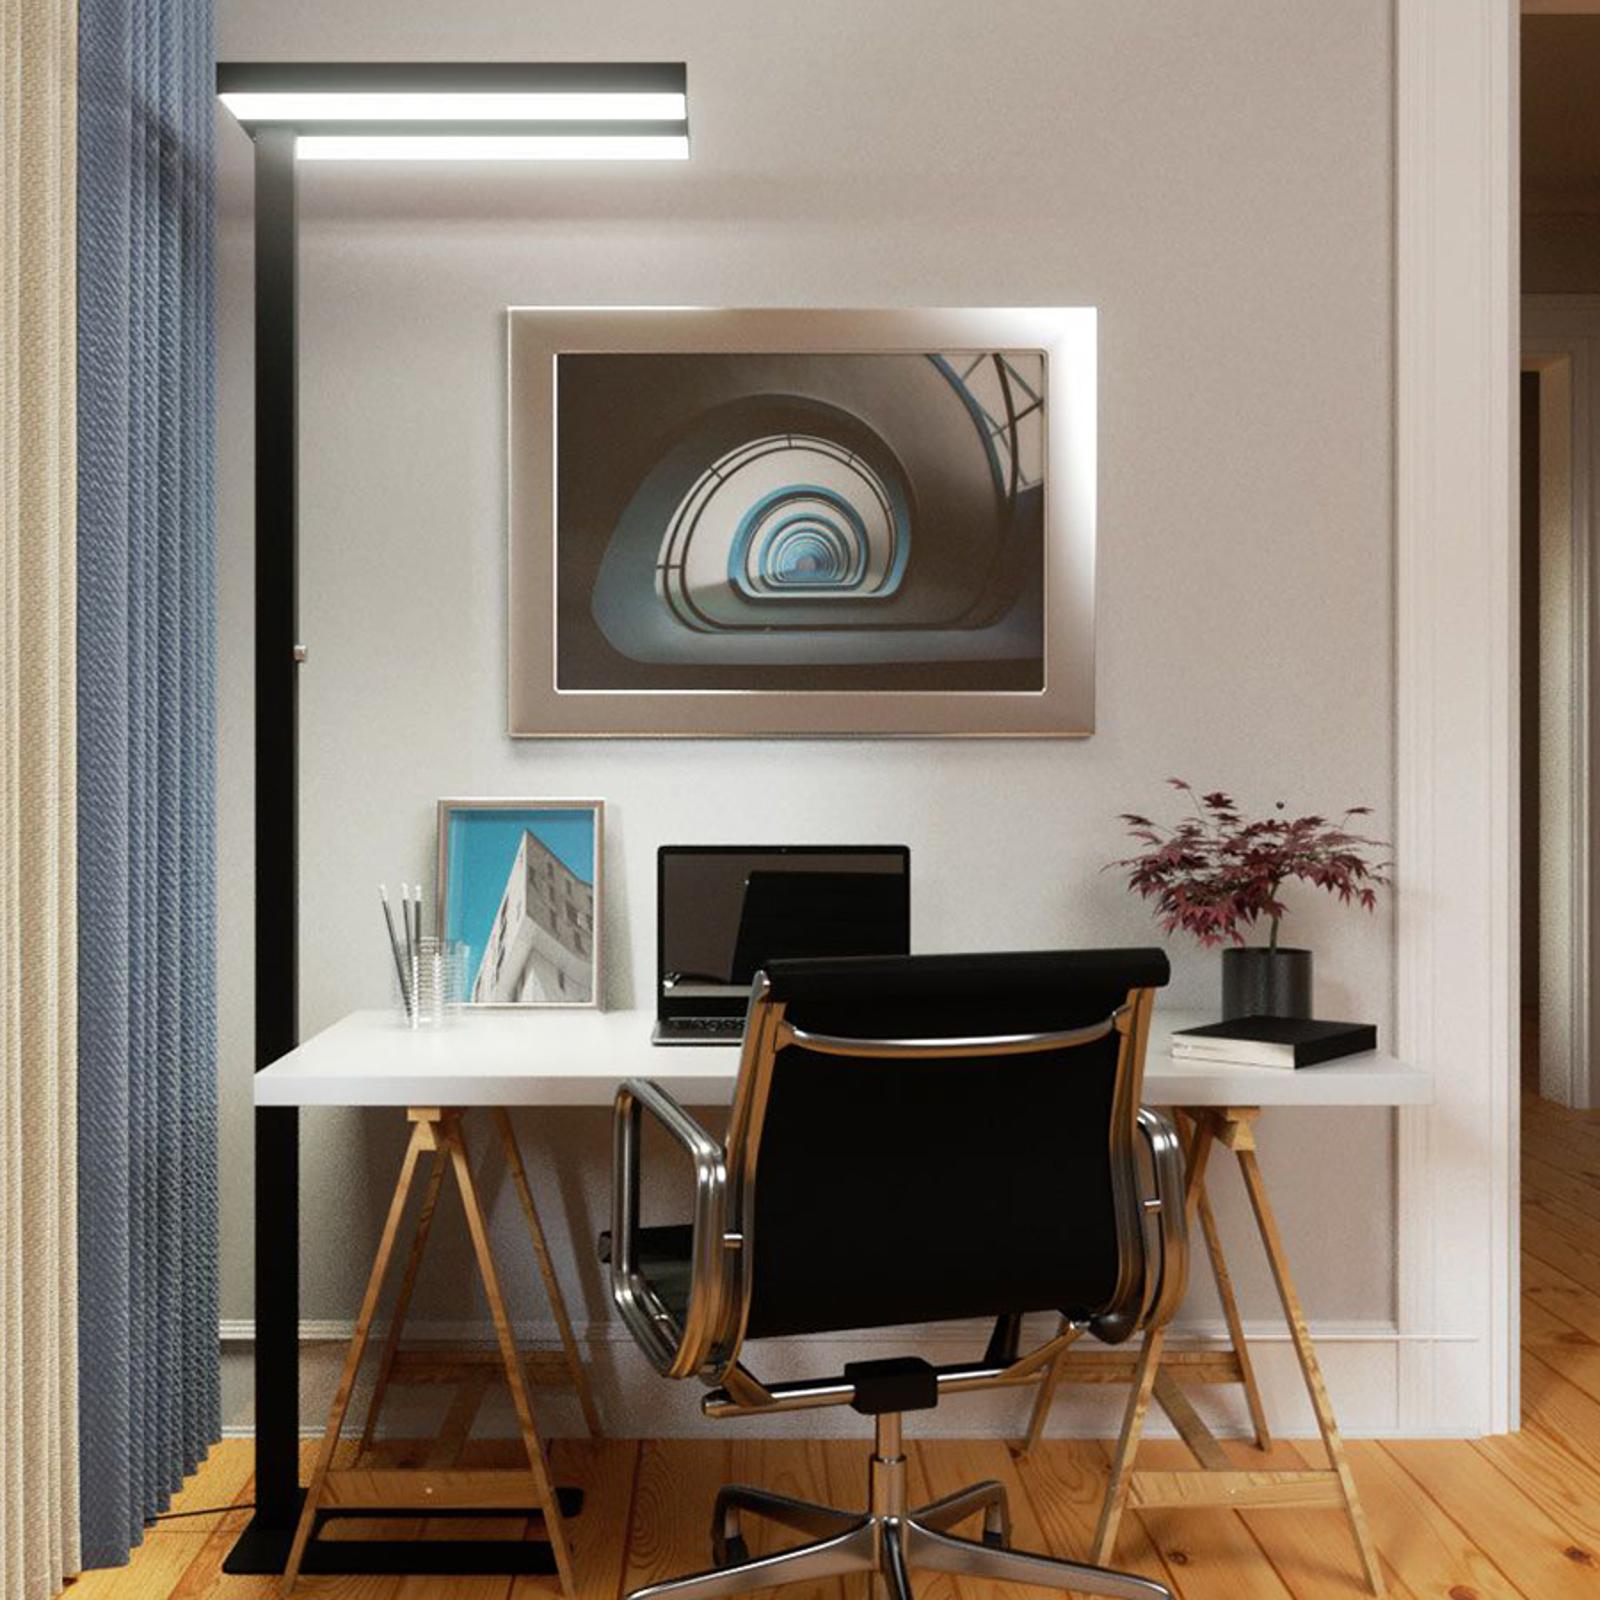 Lampadaire Office LED Logan noir, dimmable